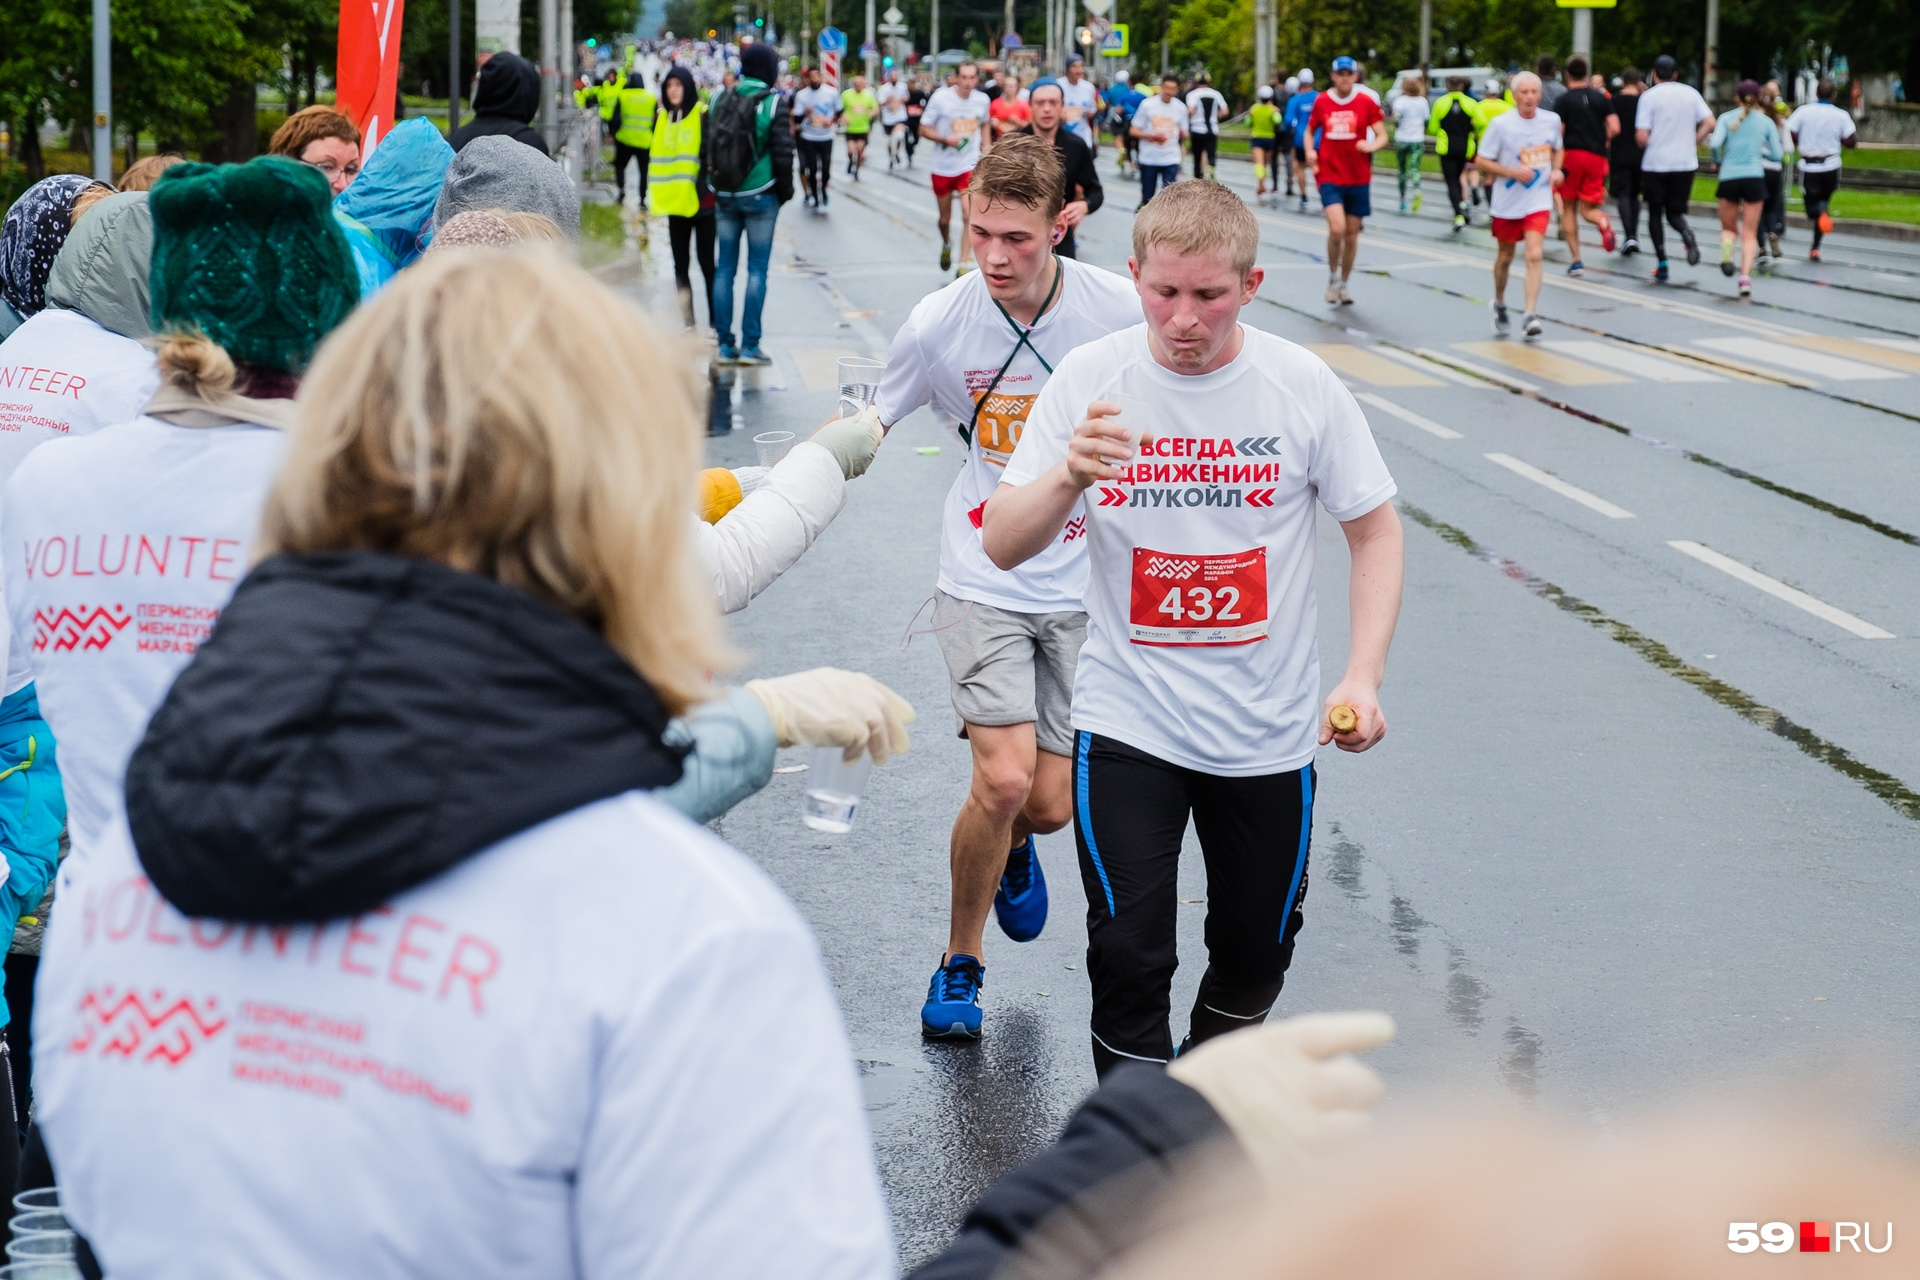 Воды, говорит участница марафона, хватало не на всех